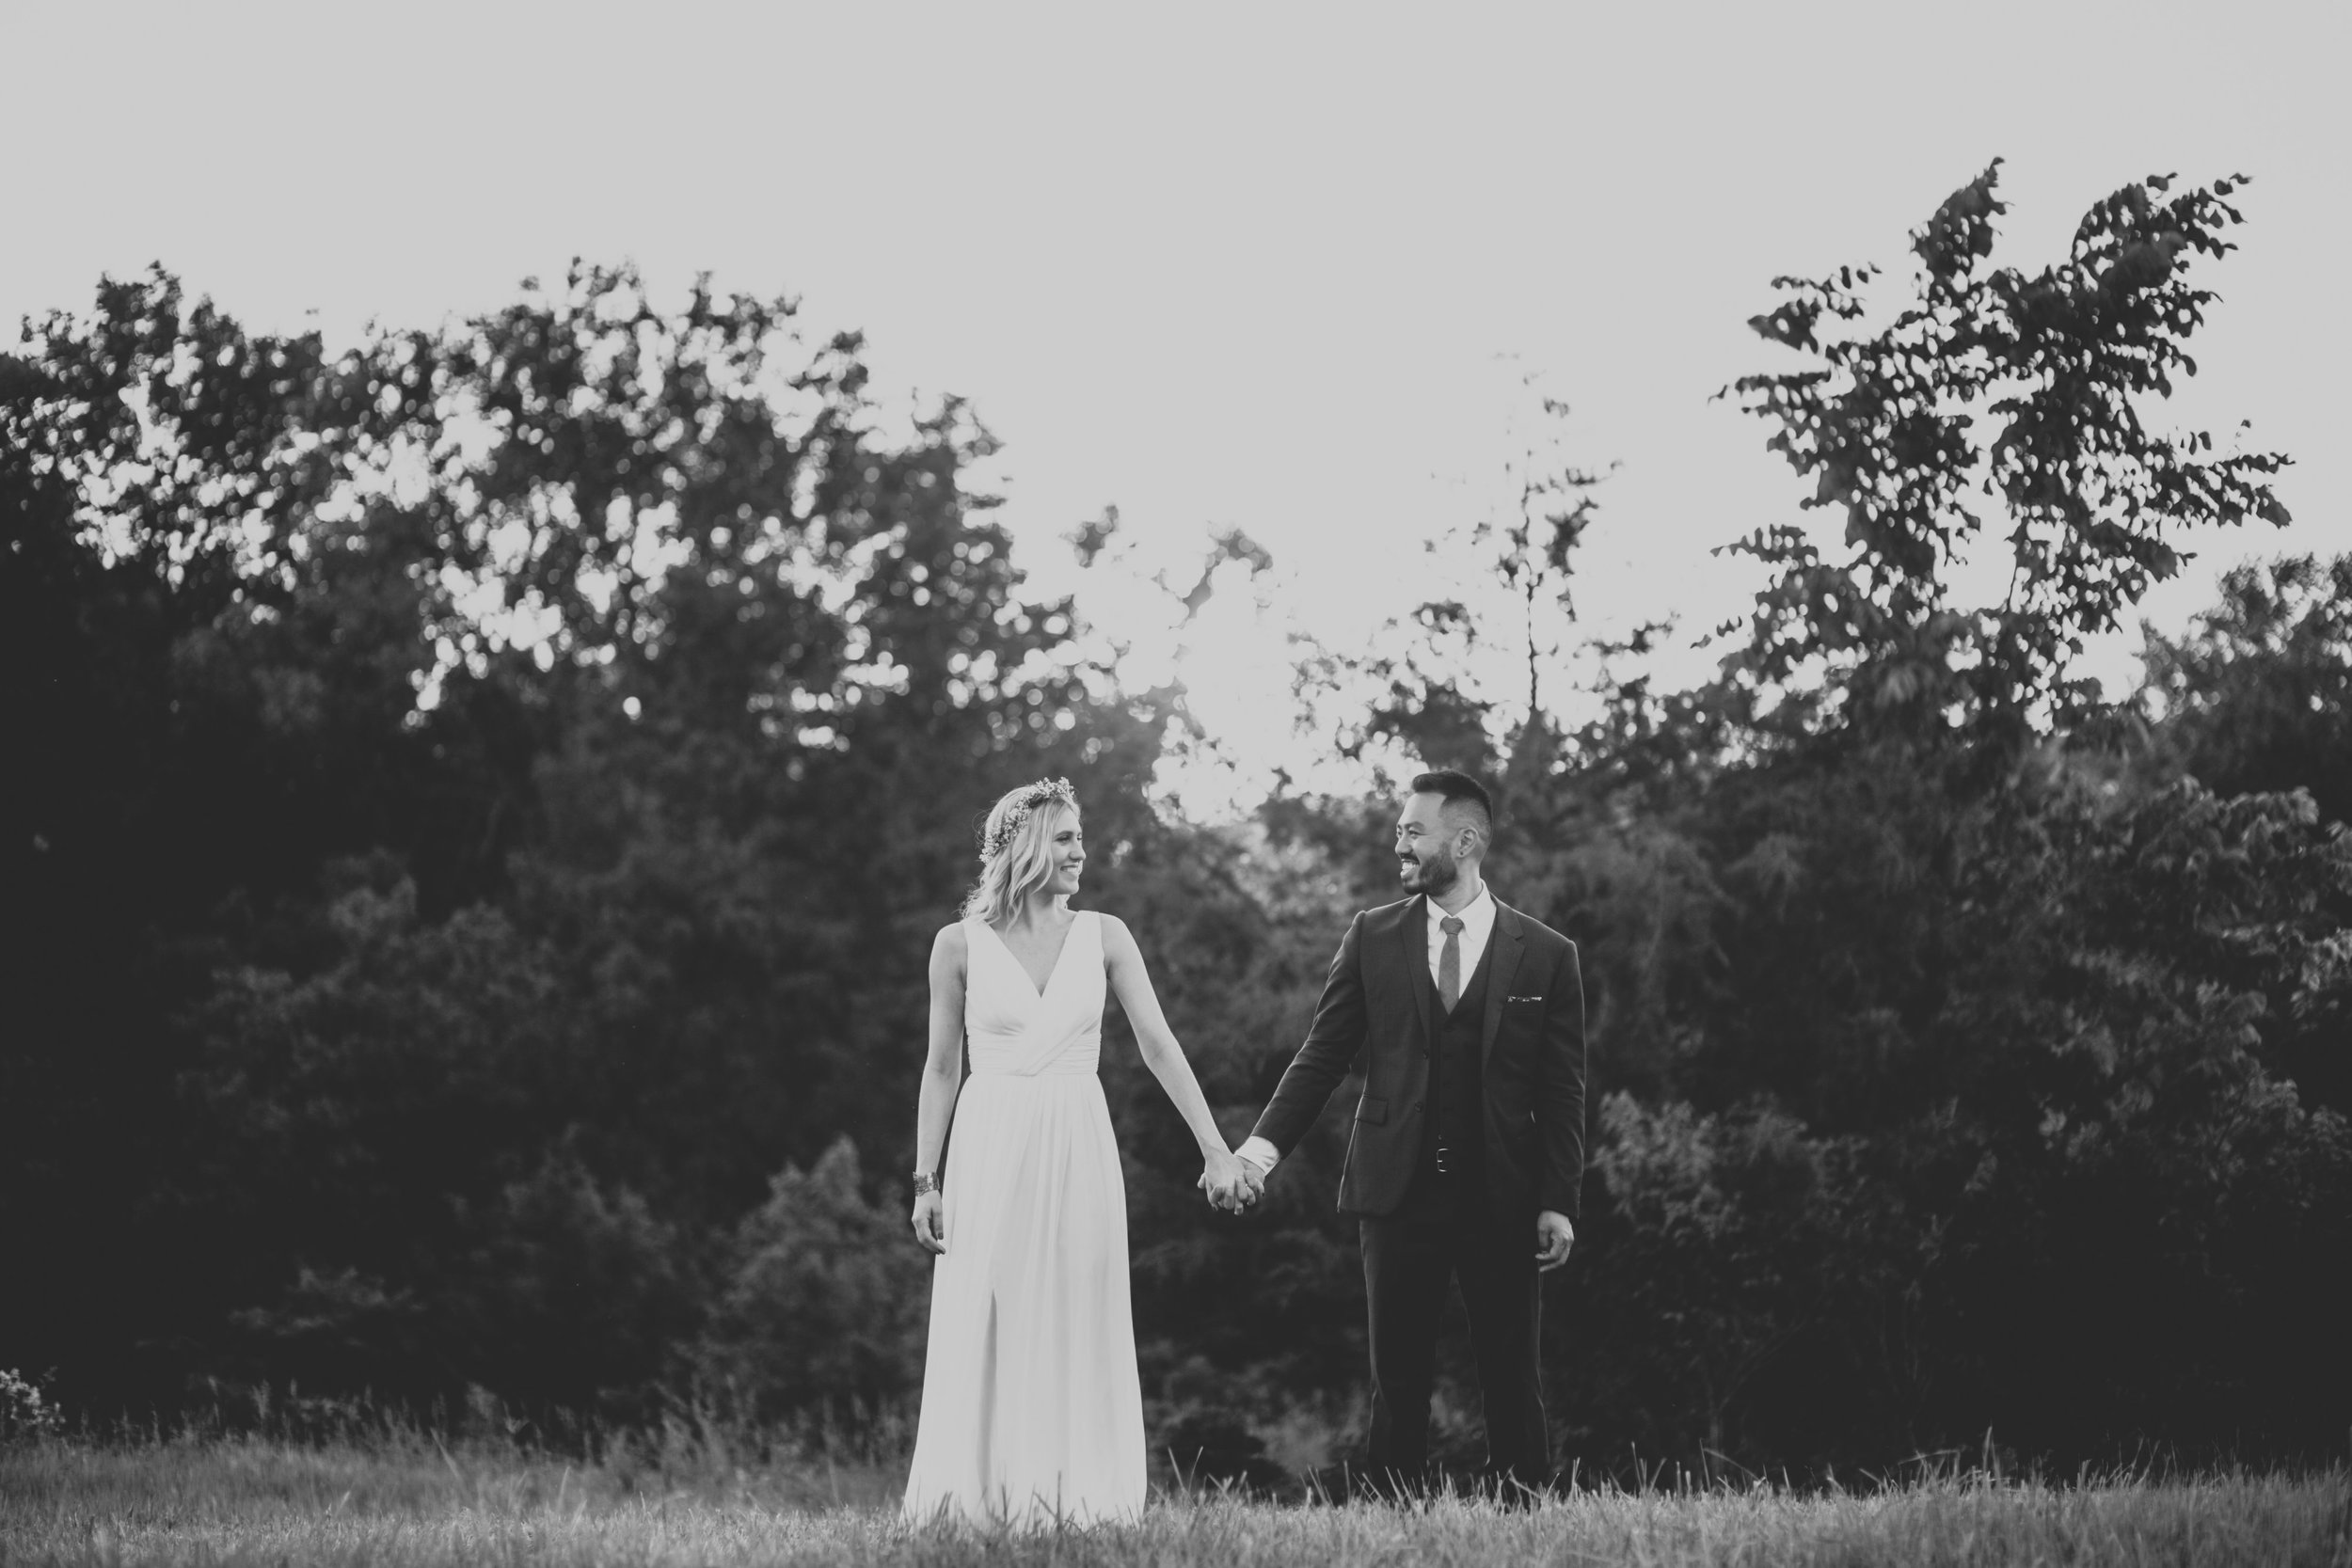 Emily and Zach-Wedding Finals 2-0173.jpg